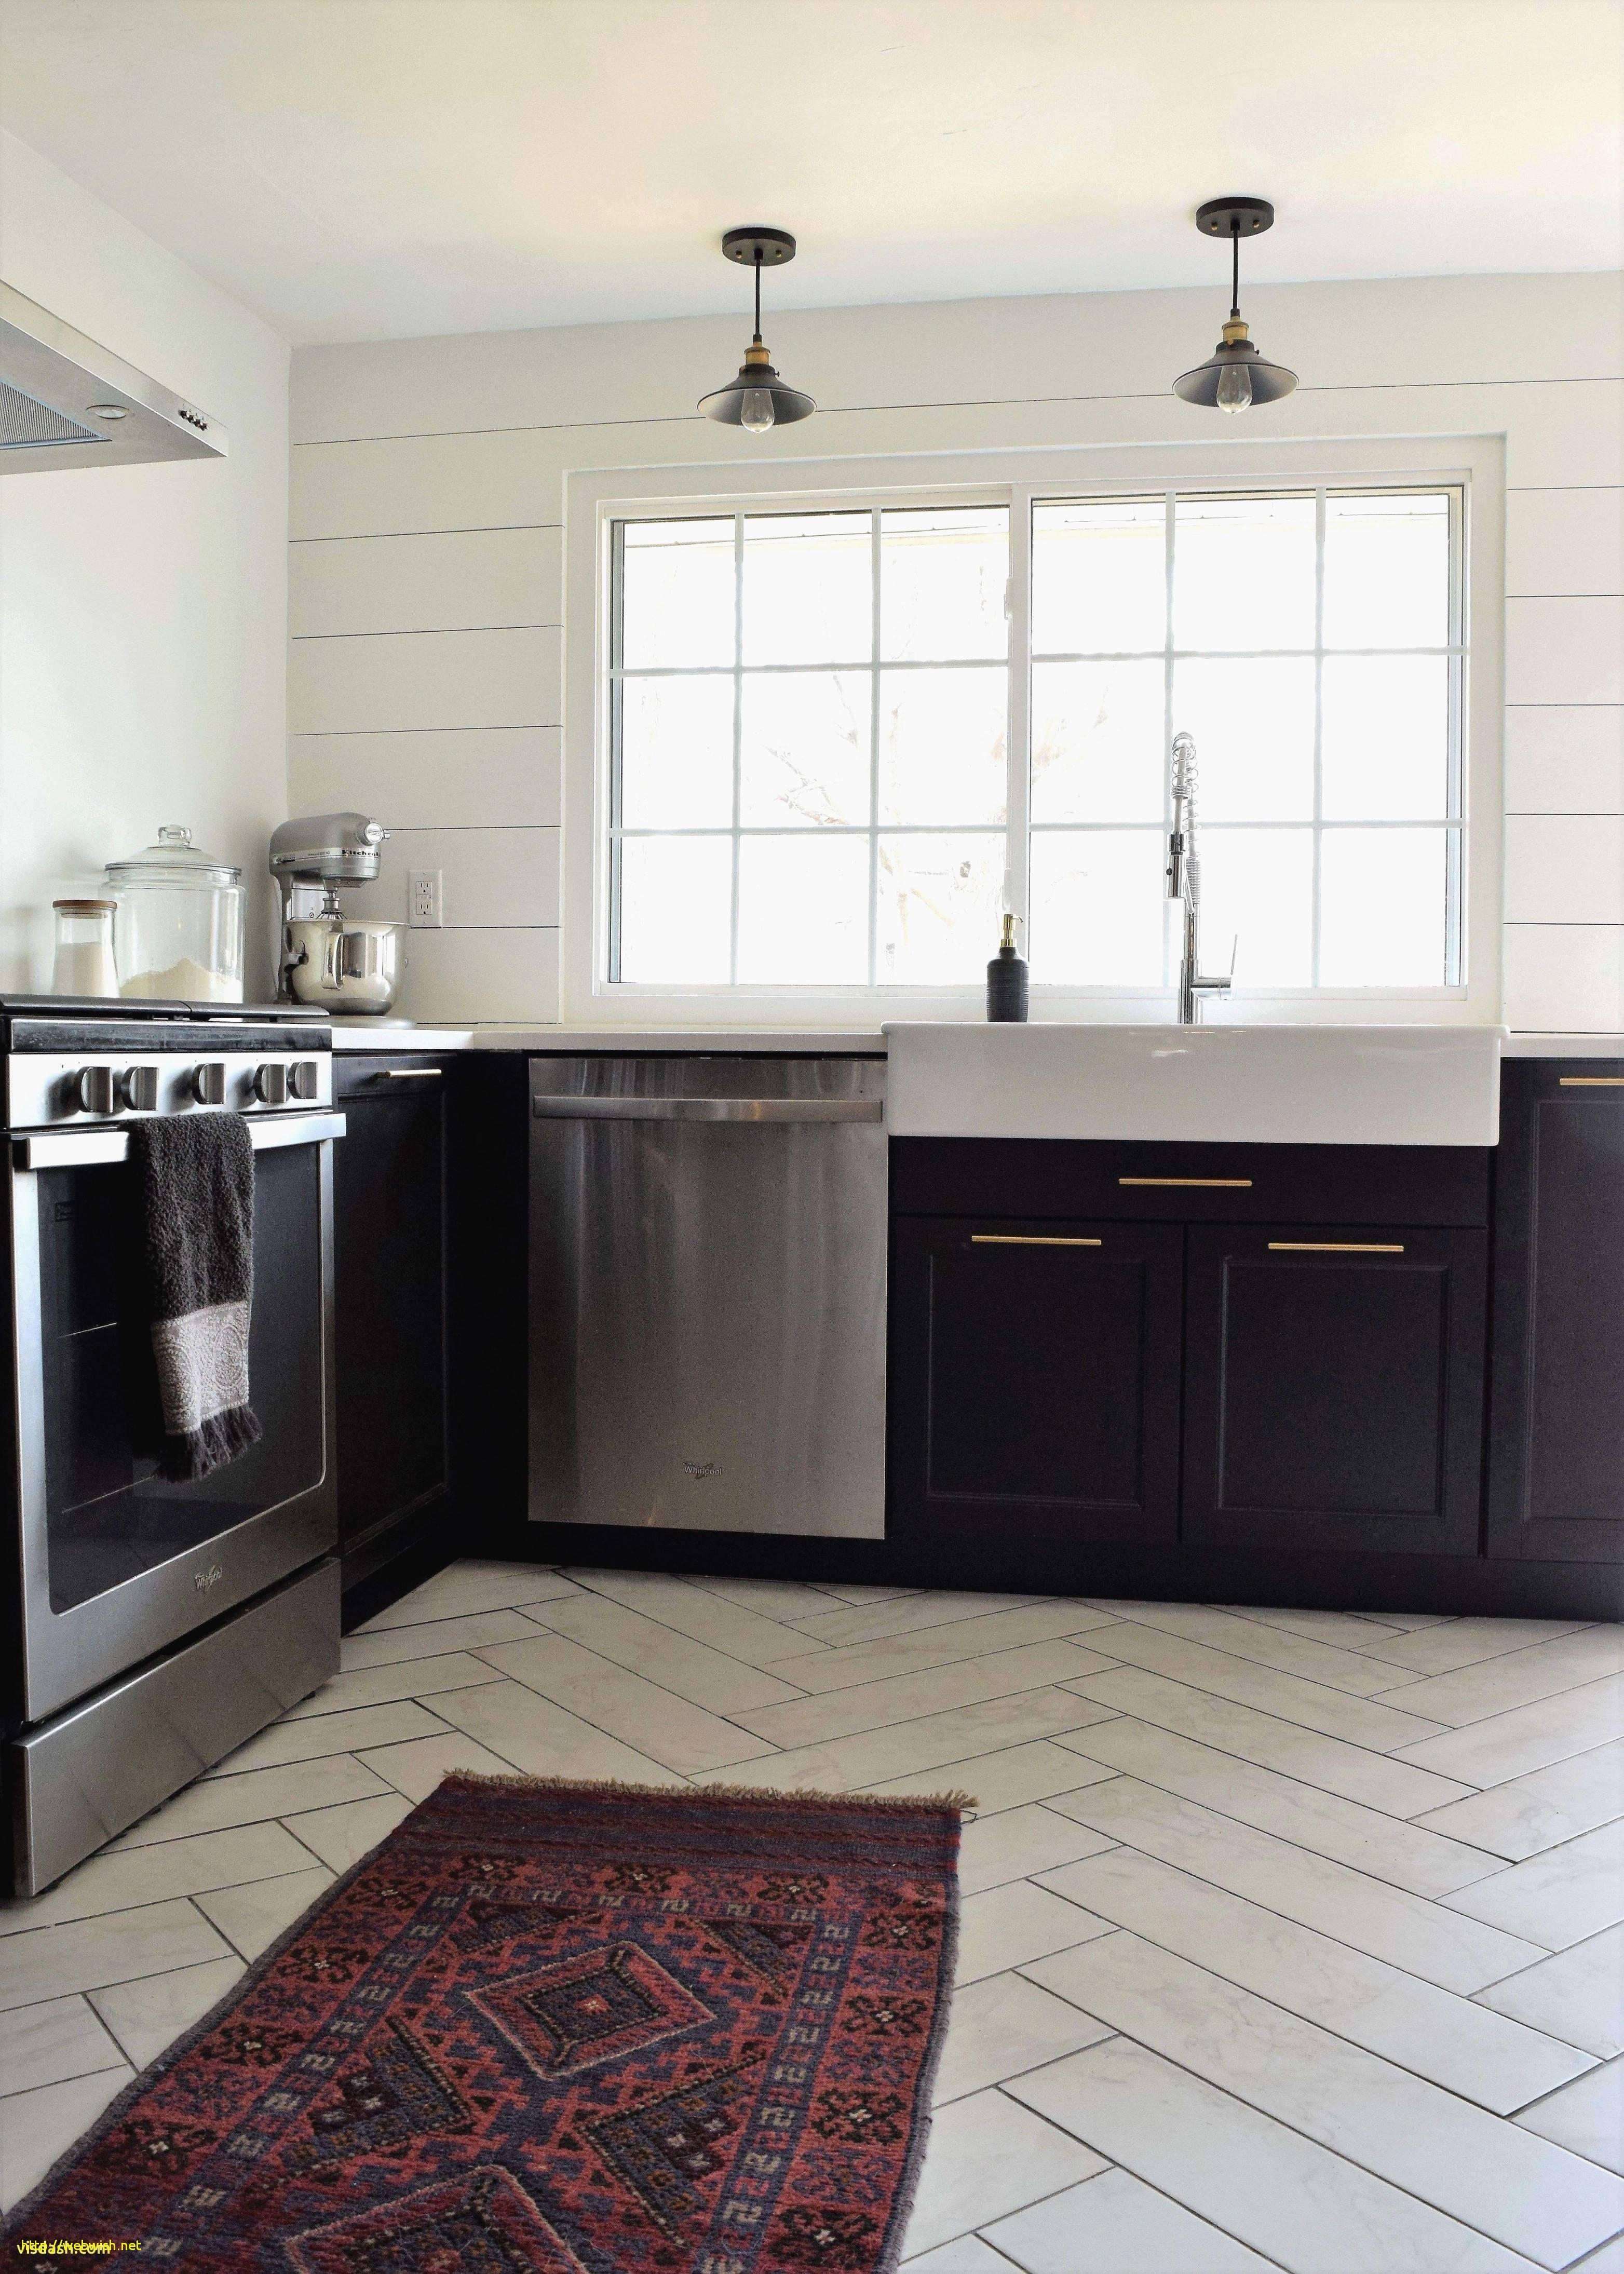 modular kitchen appliances best of agha modular kitchen designs agha interiors of modular kitchen appliances